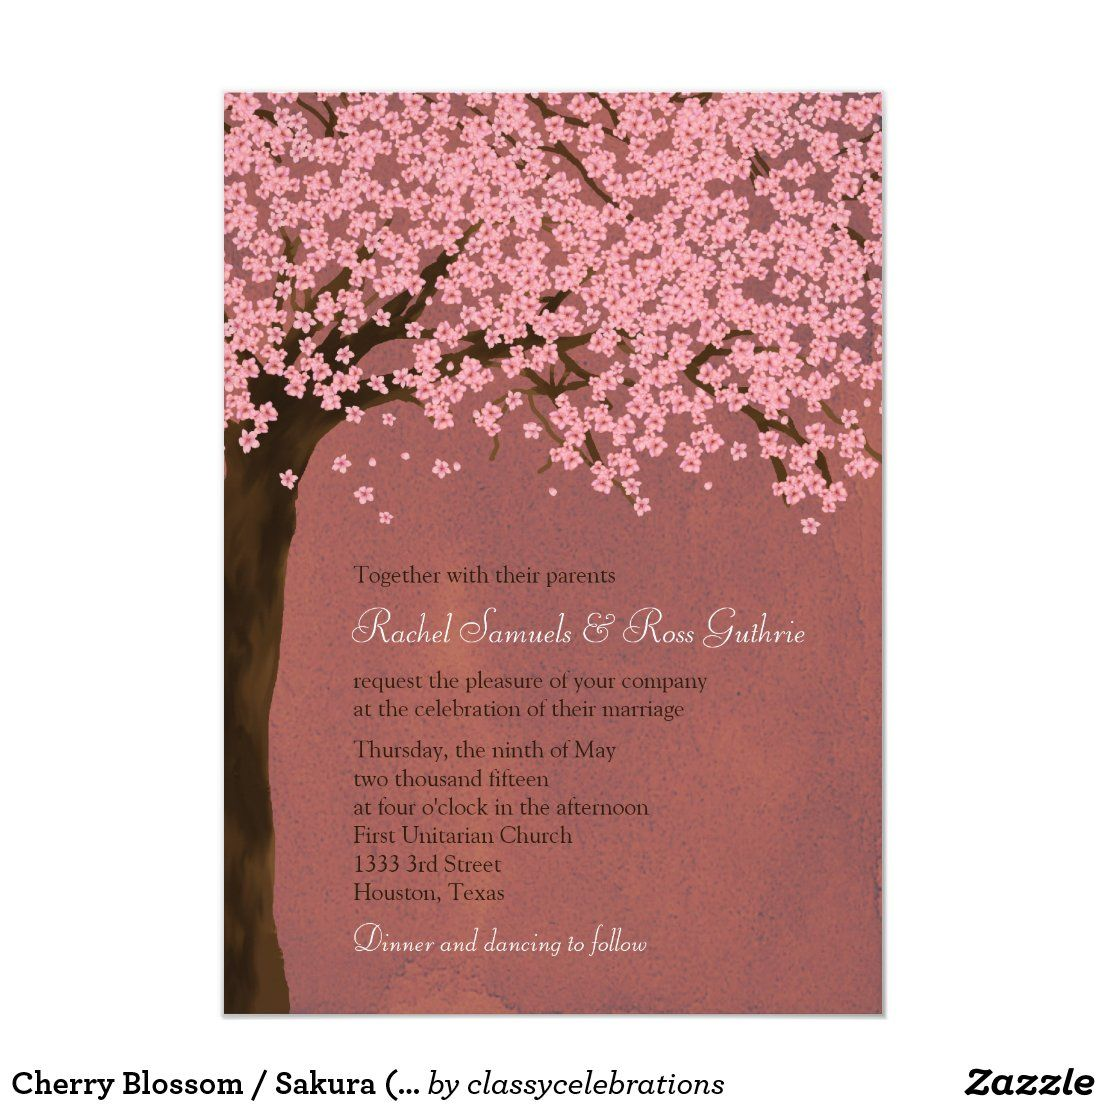 17 Beauty Of A Cherry Blossom Theme Party Weddingtopia Cherry Blossom Theme Cherry Blossom Wedding Theme Blossom Tree Wedding